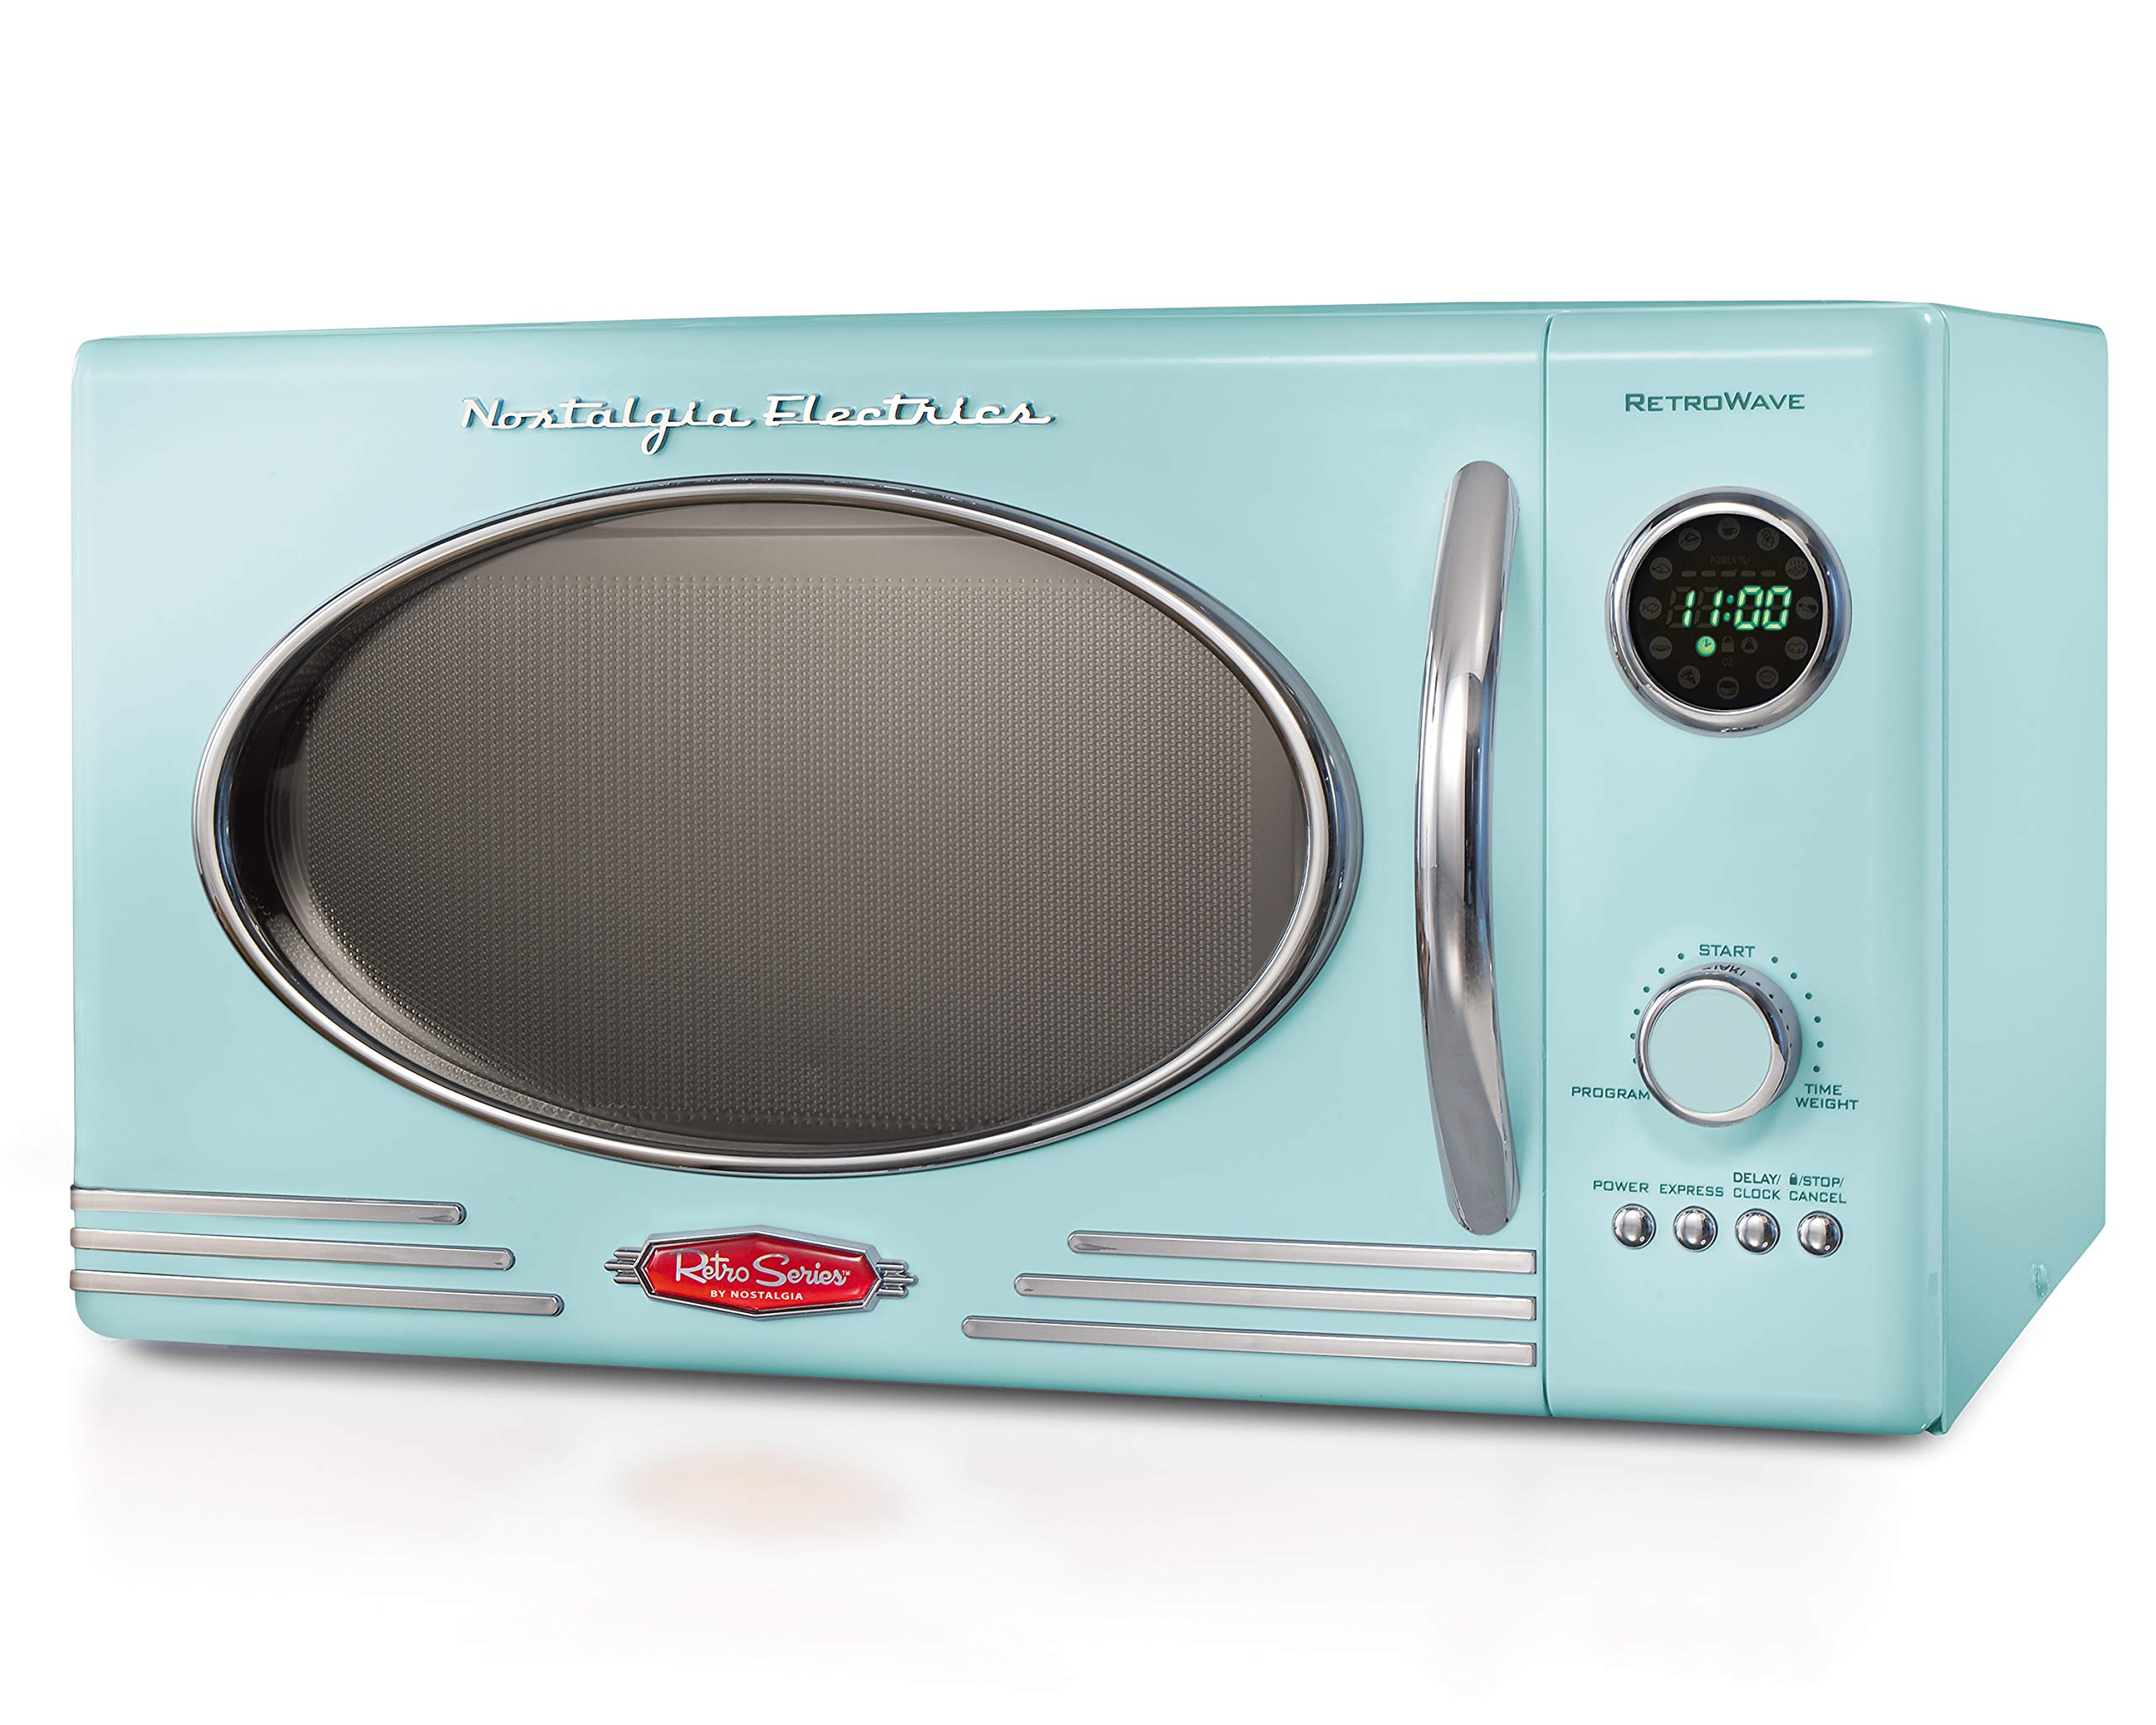 Nostalgia RMO4AQ 800 Watt Countertop Microwave